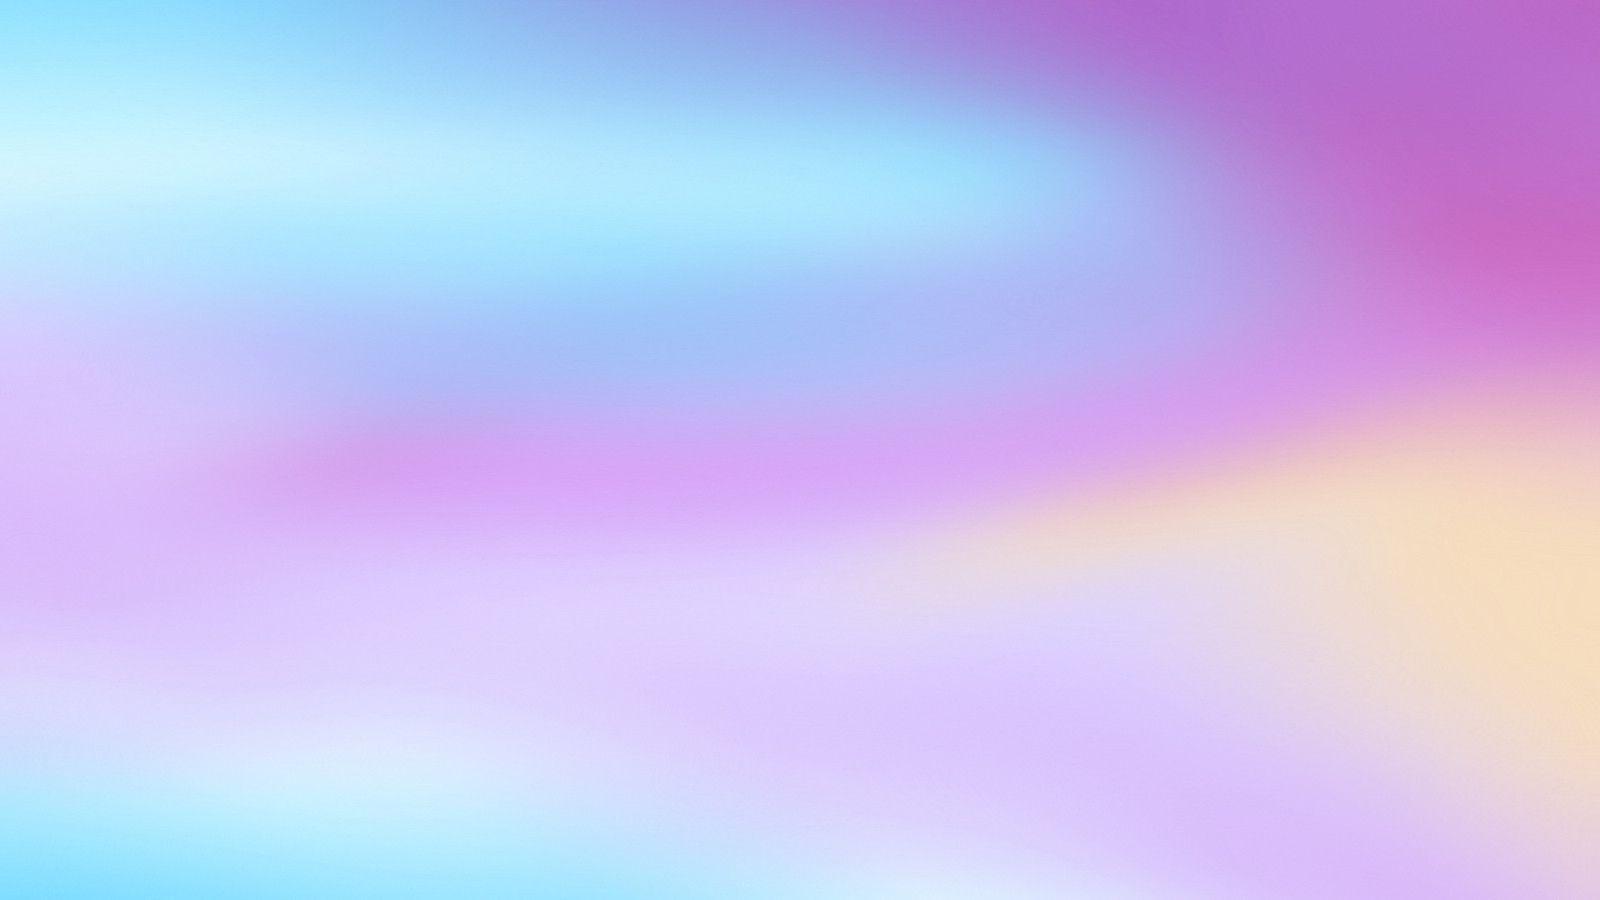 Pastel Wallpapers 1600x900